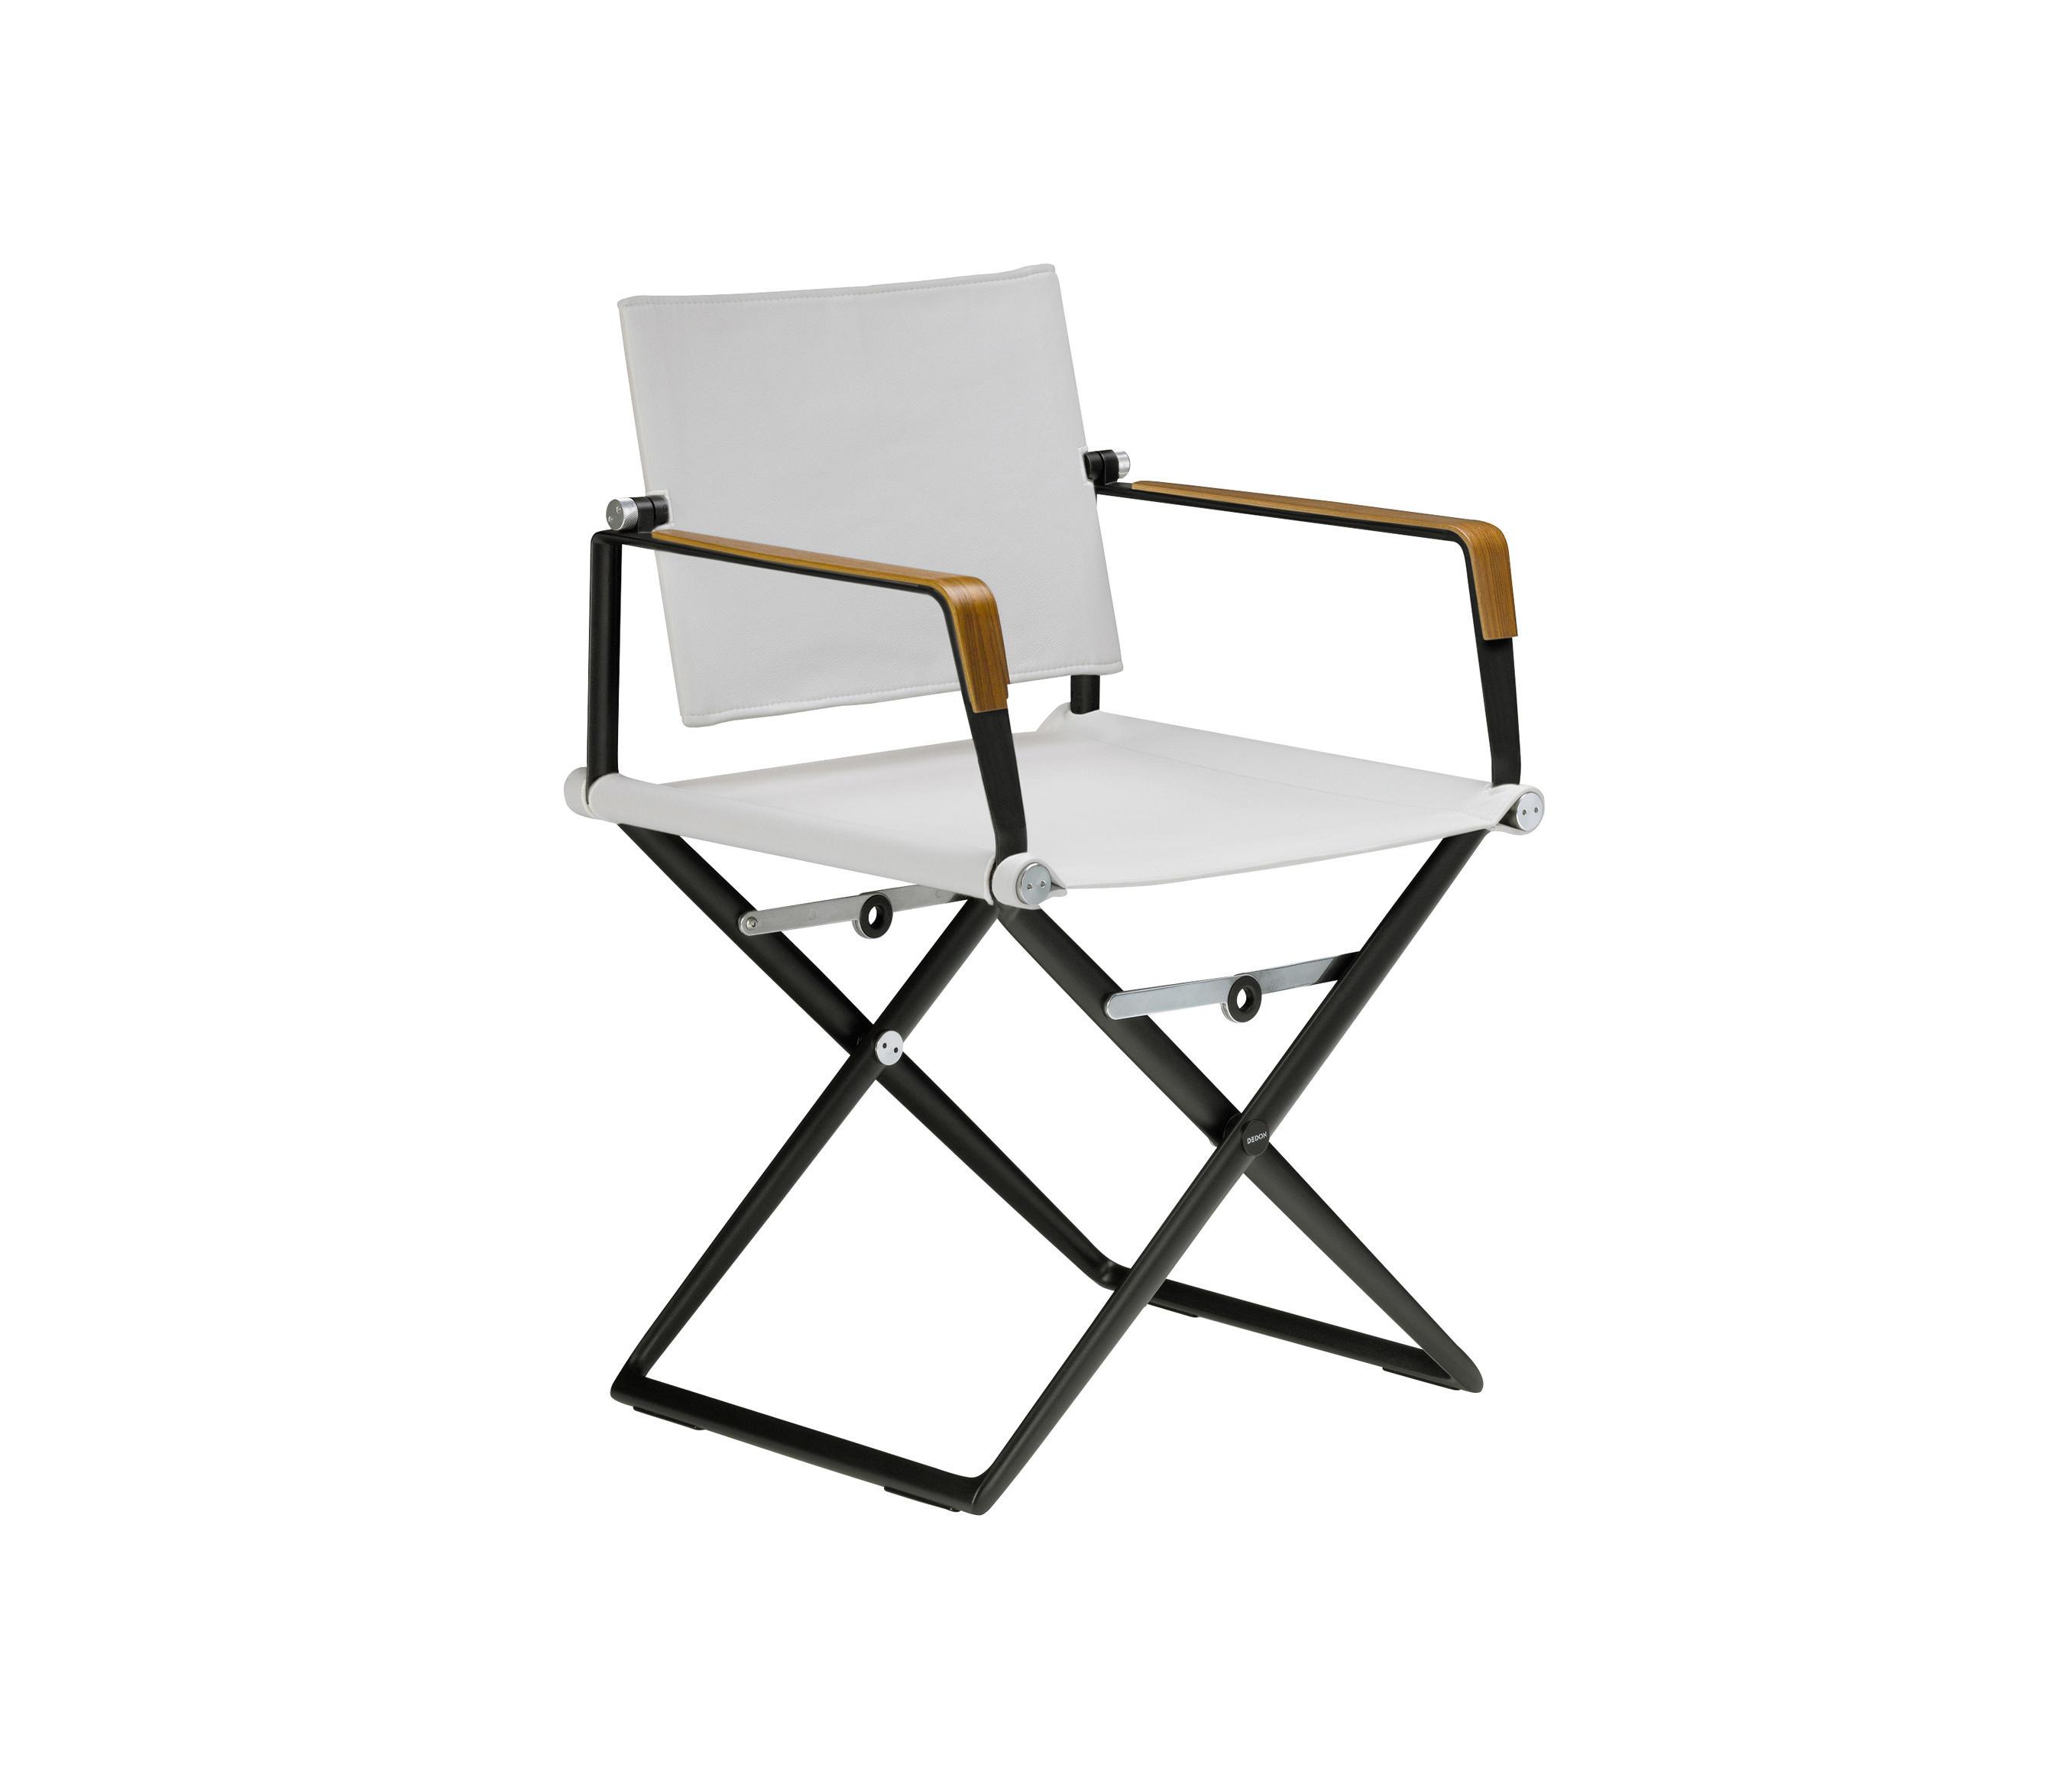 ... SeaX Chair By DEDON | Chairs